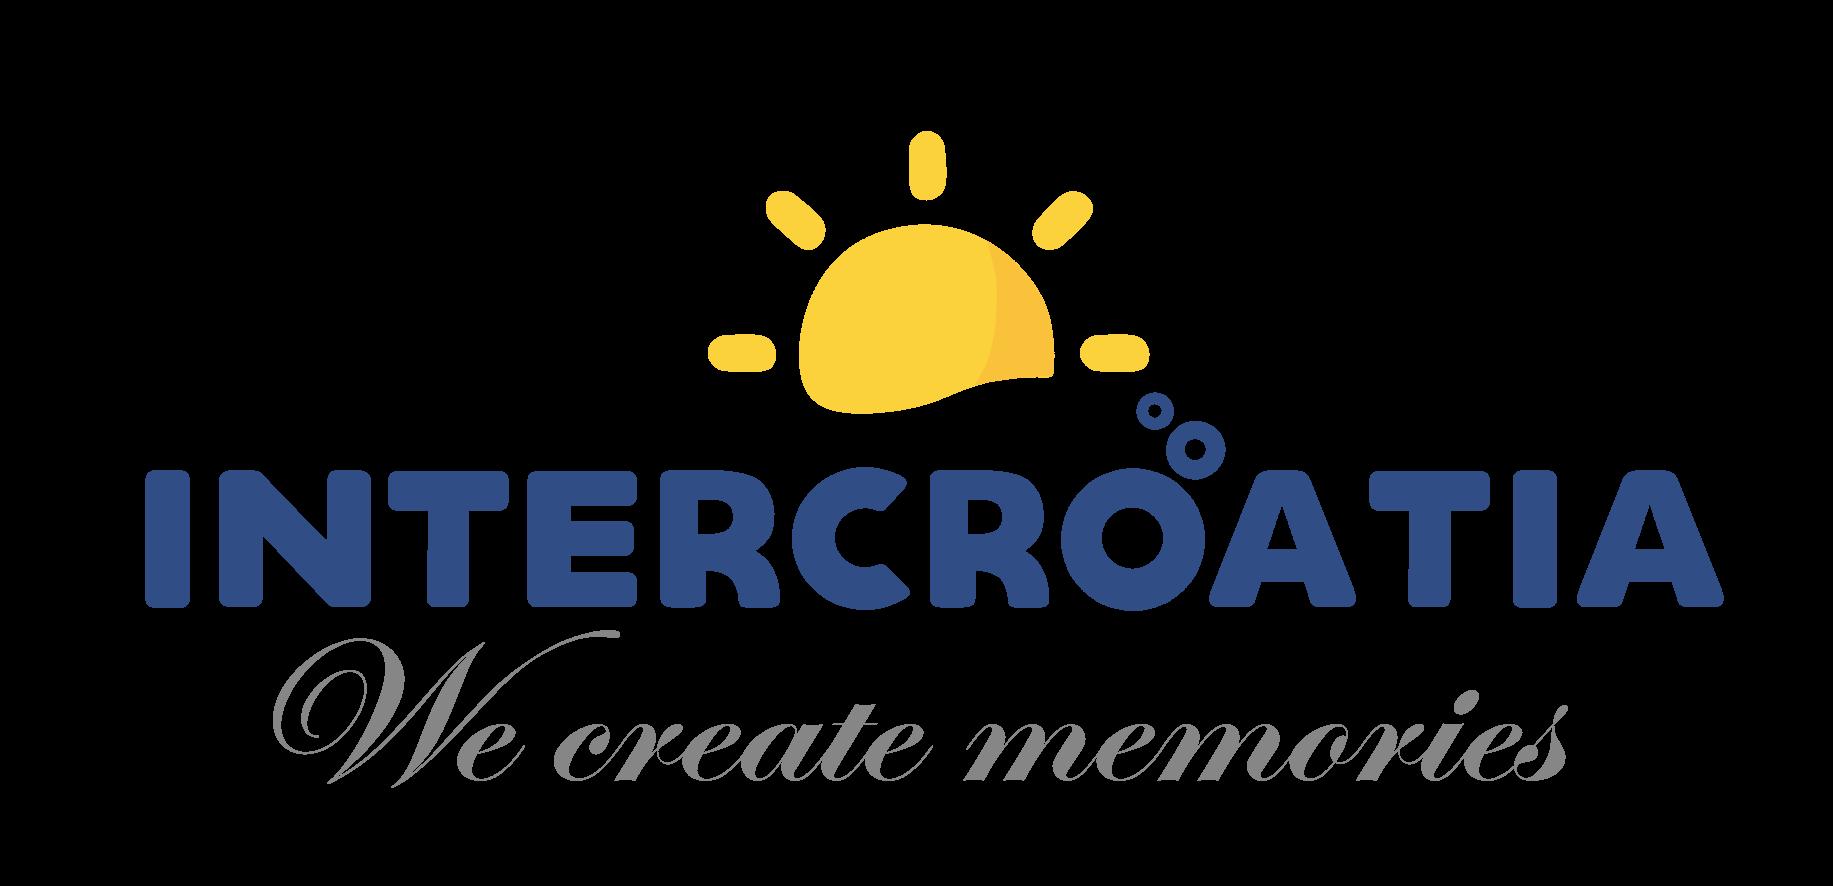 InterCroatia